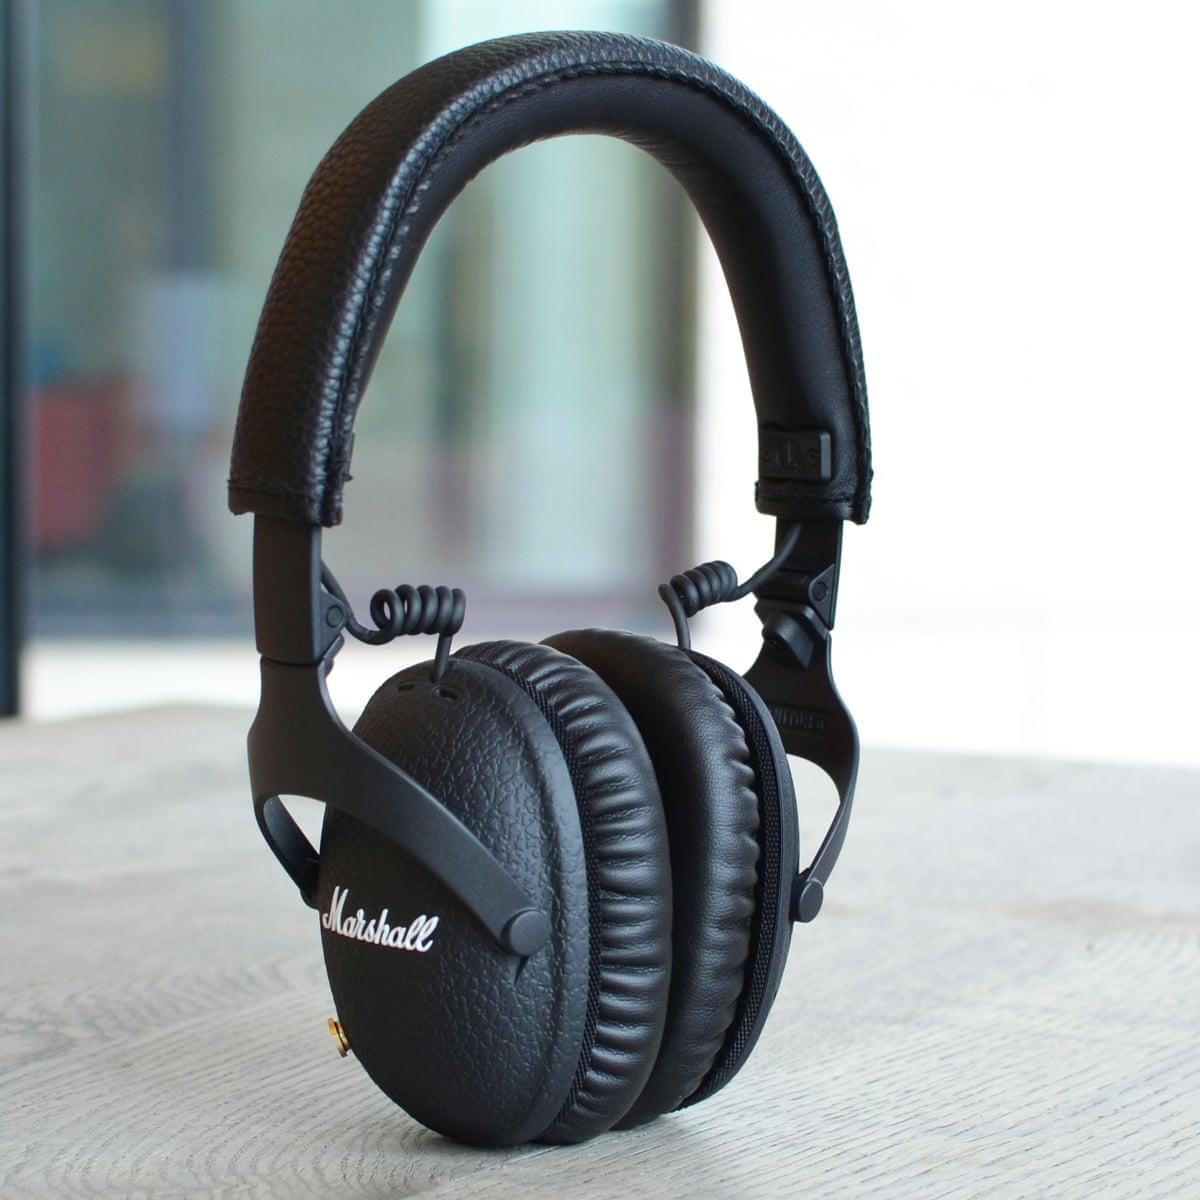 Marshall Monitor II ANC review: classic headphones gain noise